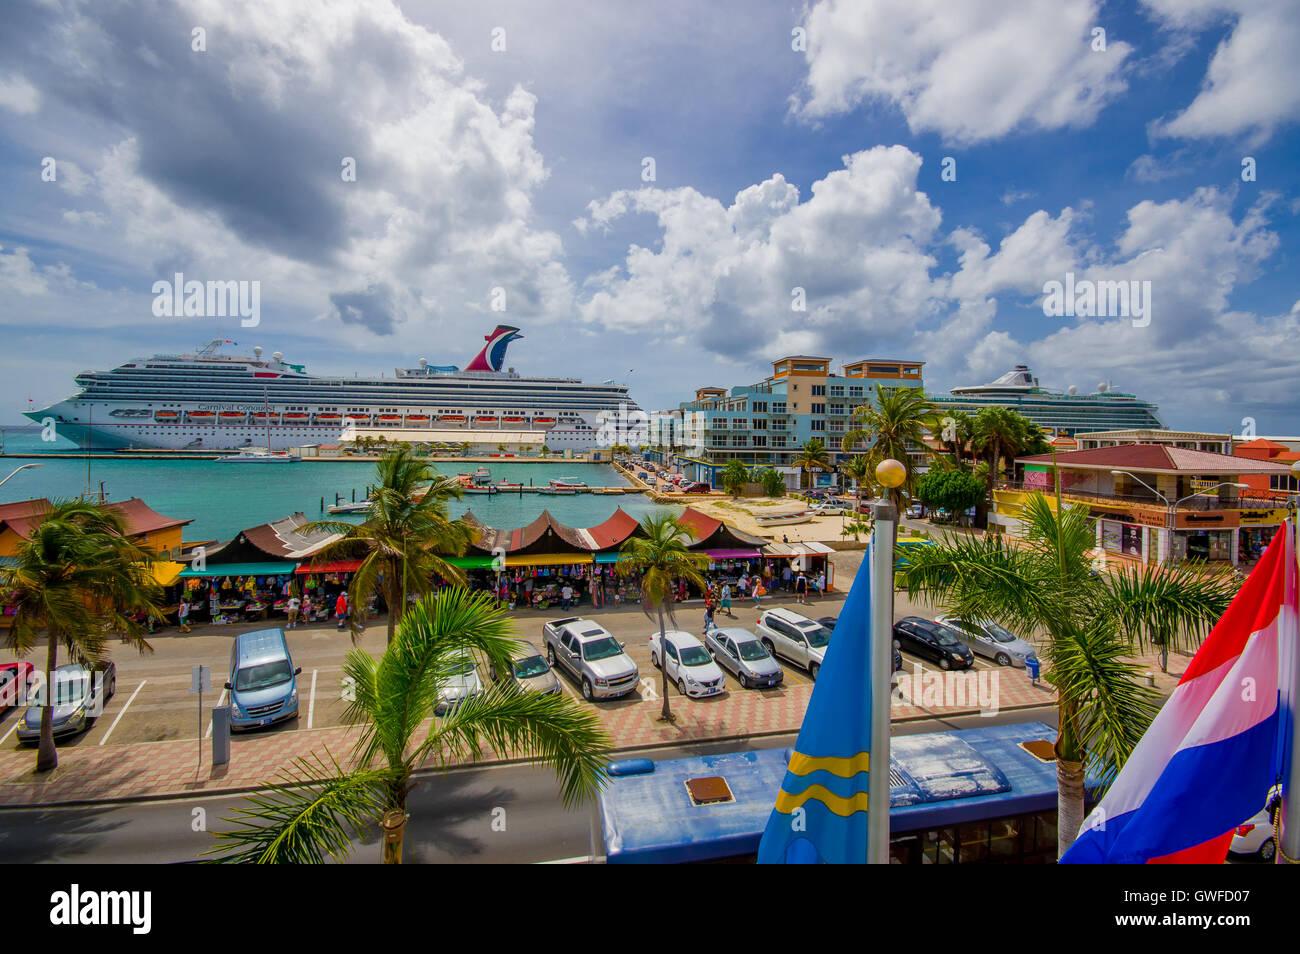 ORANJESTAD ARUBA NOVEMBER Port Used For Tourism Of - Cruise ships in aruba